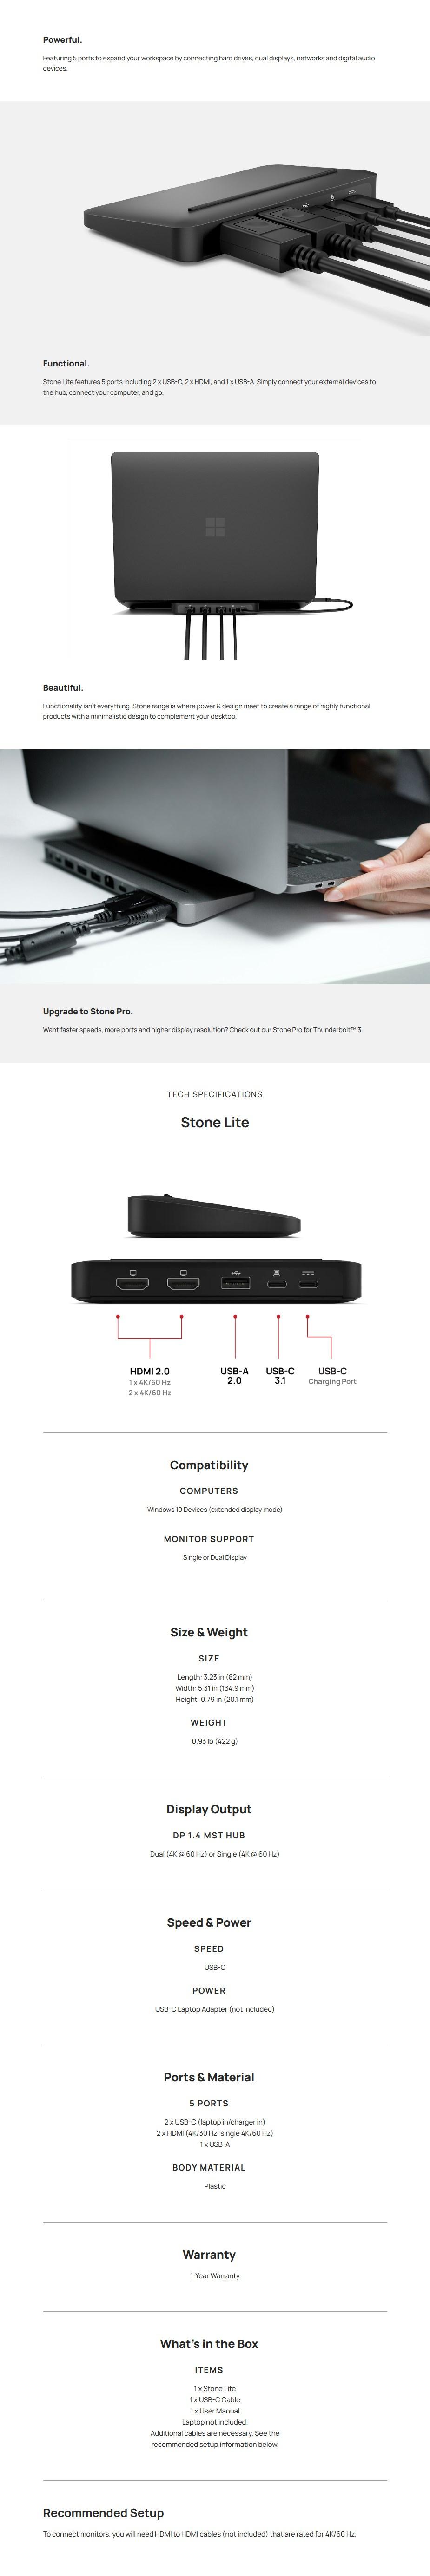 Brydge Stone Lite USB-C Multi-Port Laptop/Desktop Hub - For Windows - Overview 1